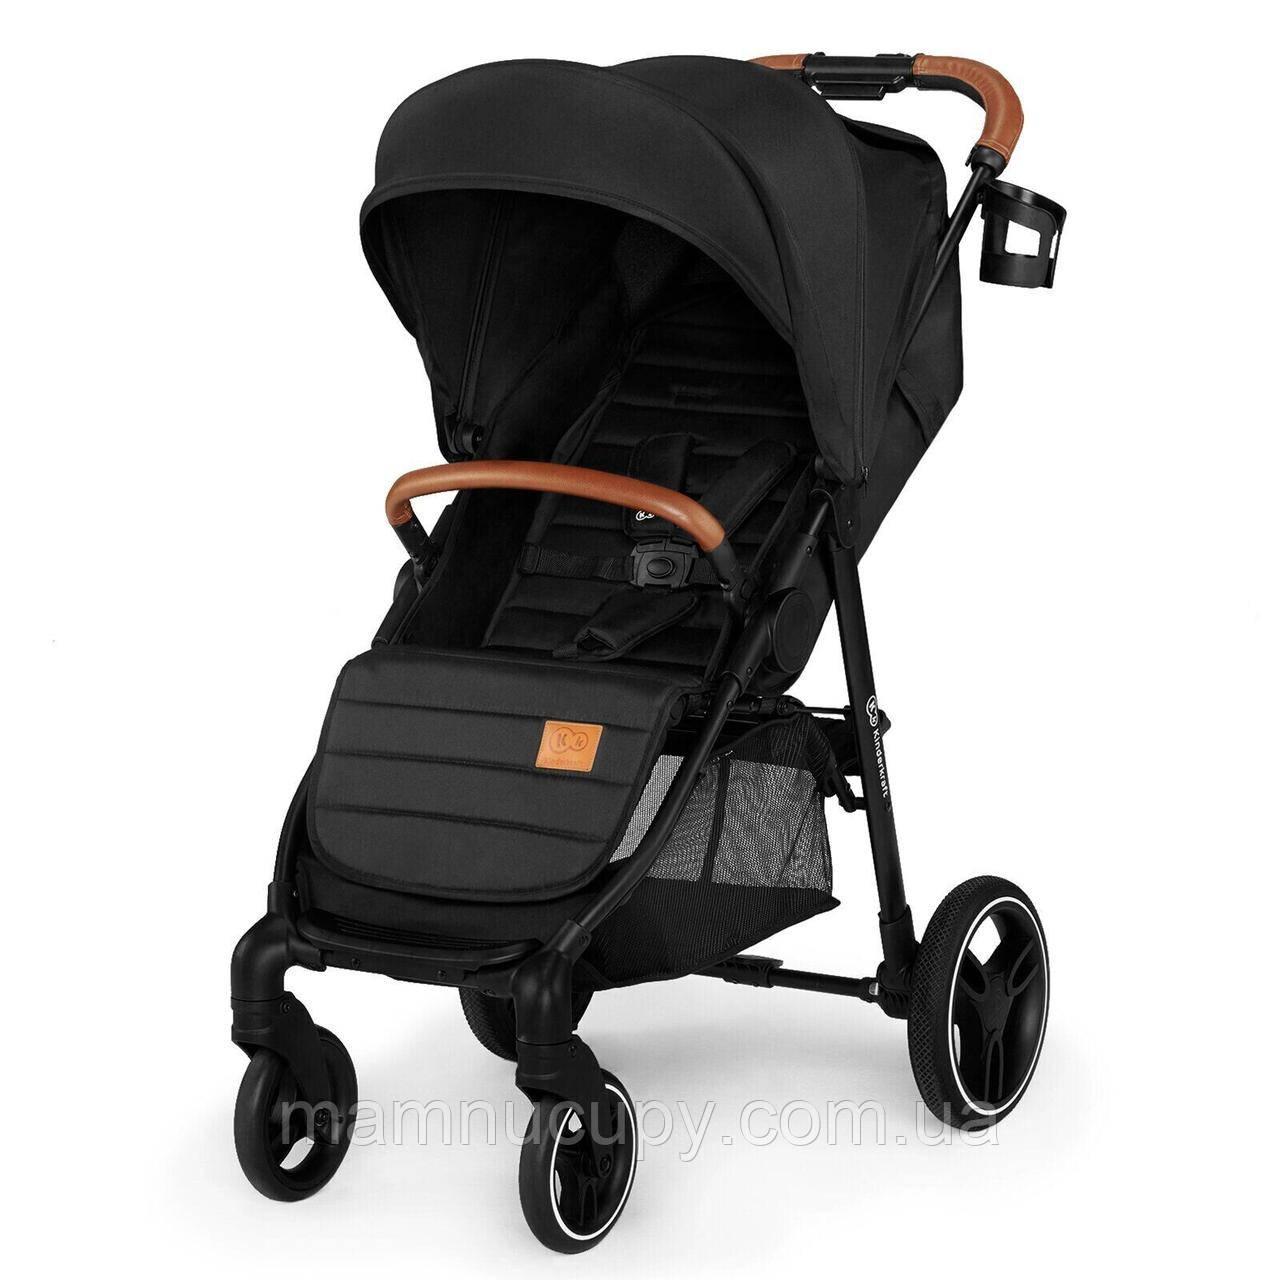 Дитяча прогулянкова коляска Kinderkraft Grande 2020 Black (Киндеркрафт)